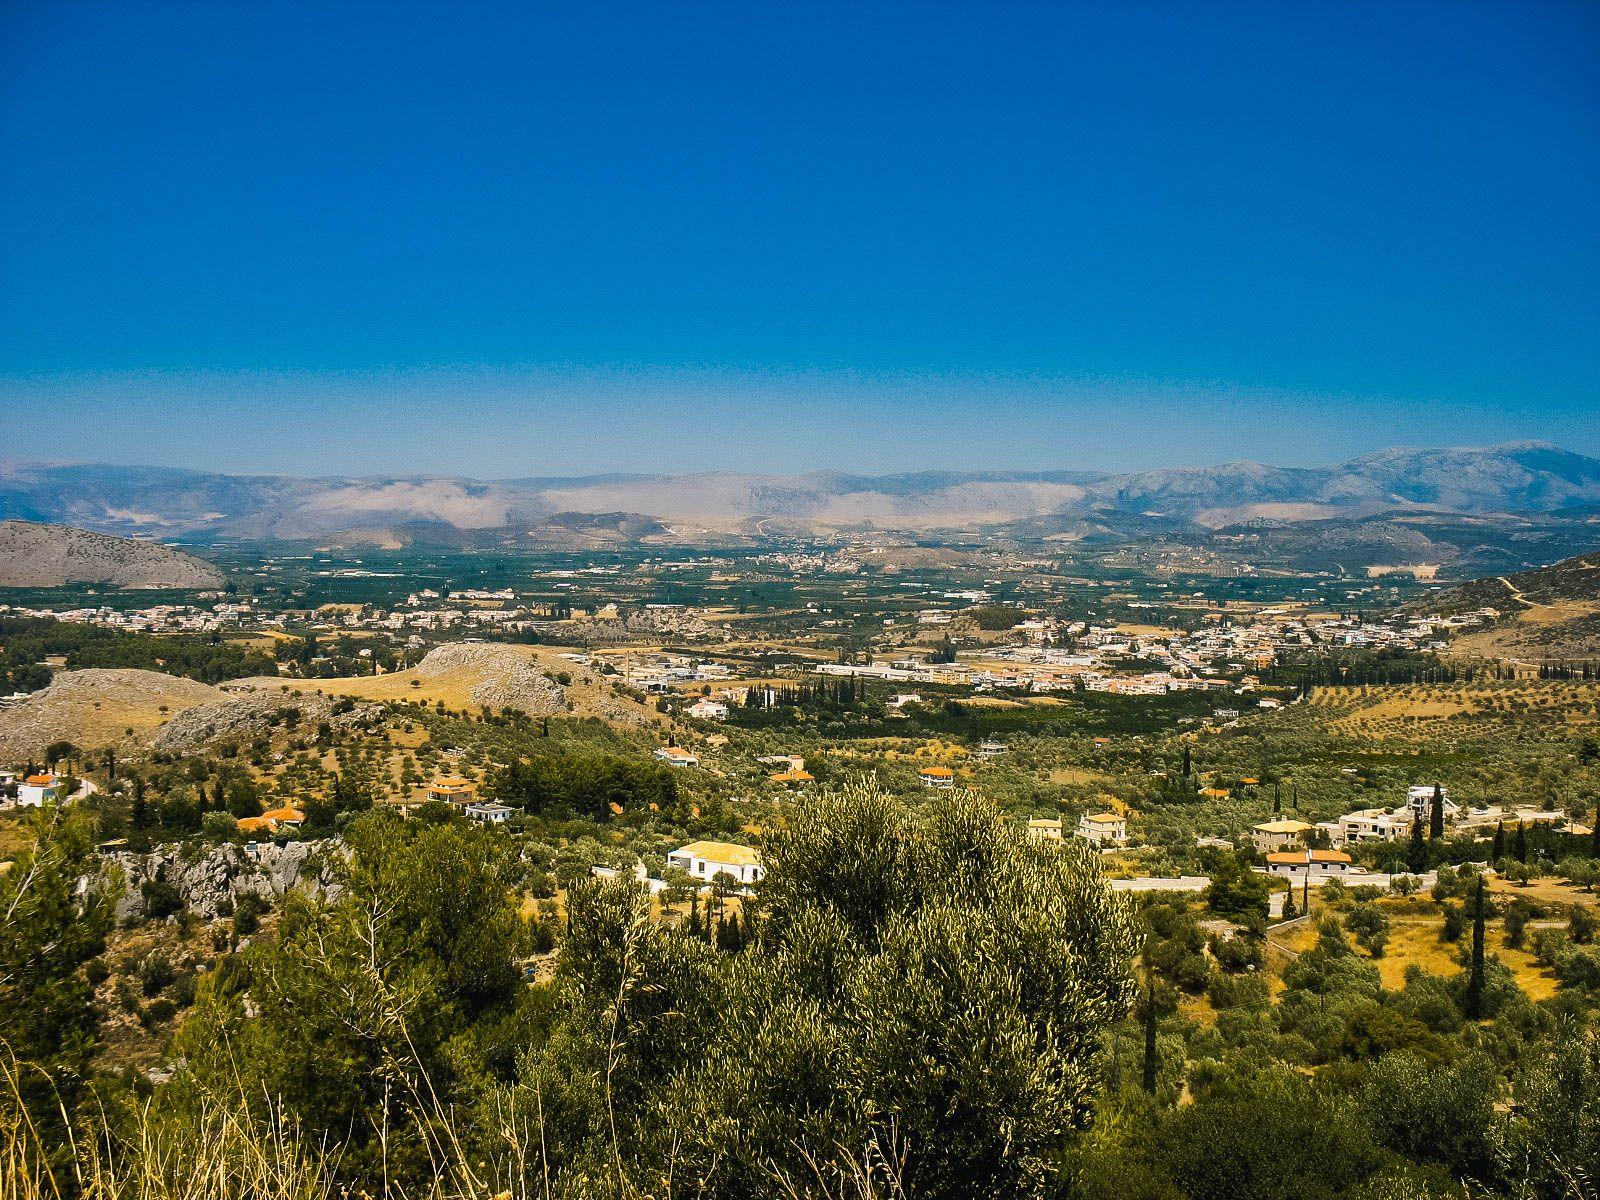 Долина на полуострове Пелопоннес, Греция (17.07.2008)